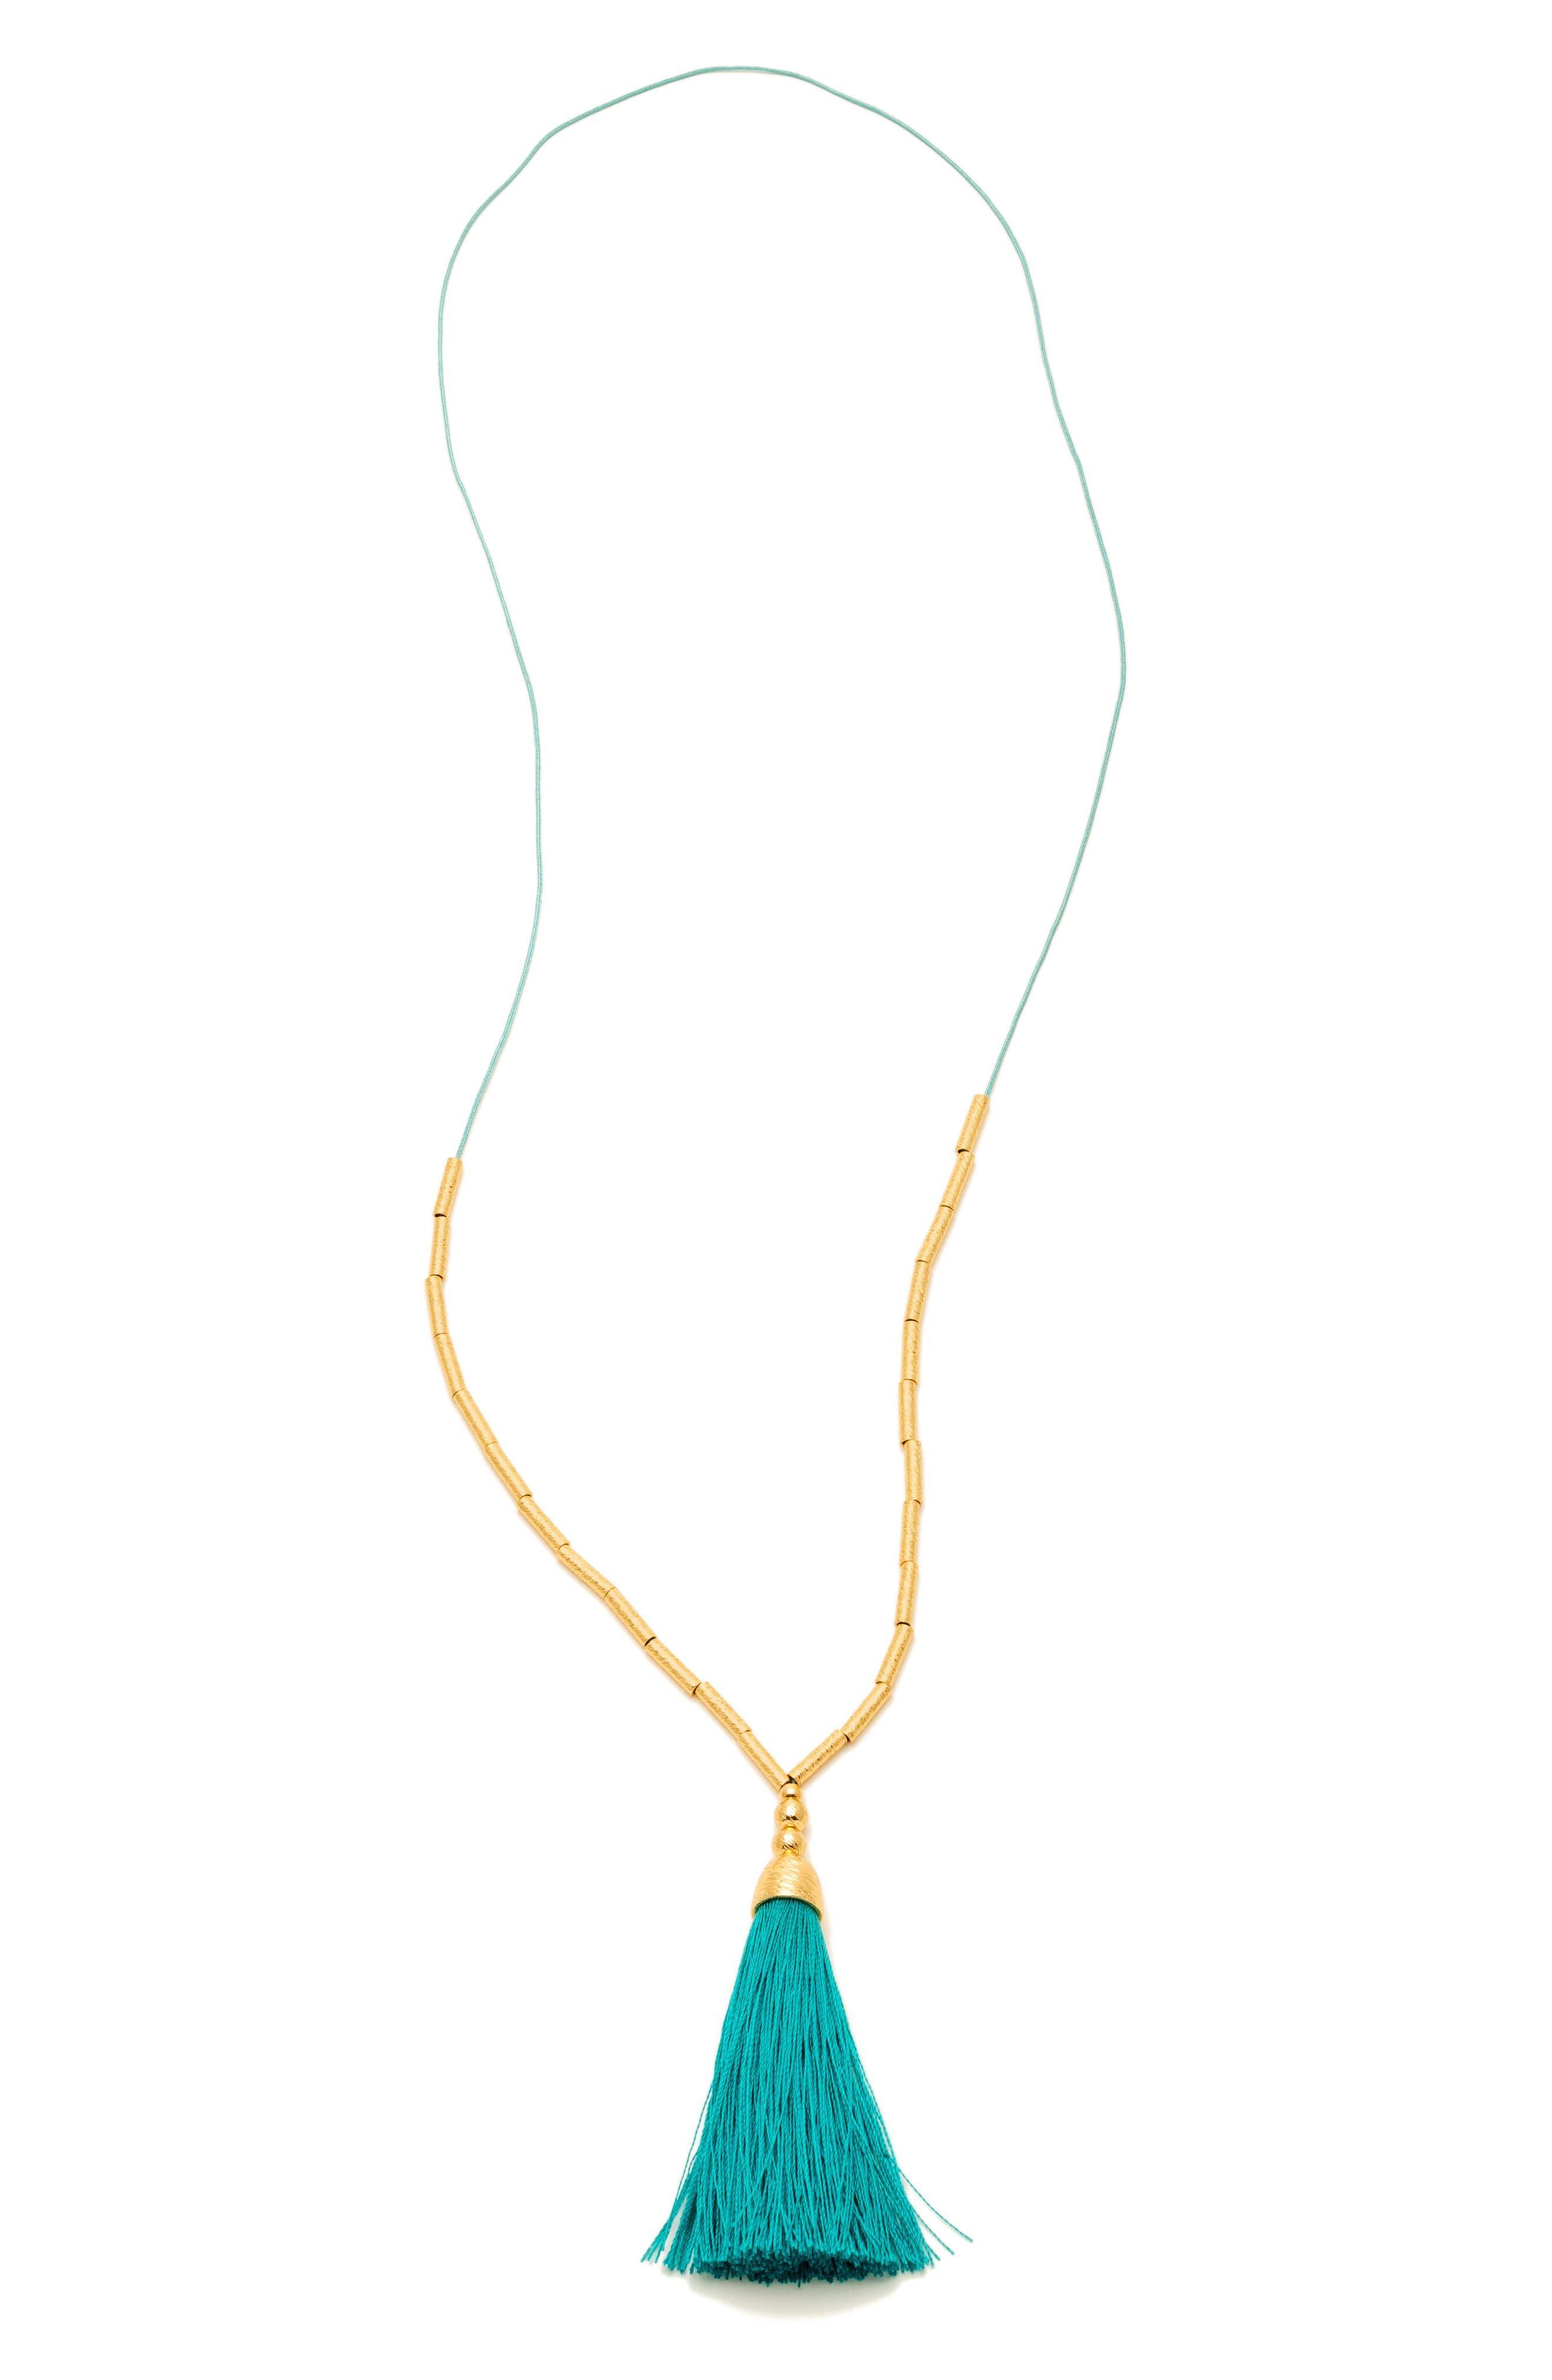 Tulum Long Tassel Pendant Necklace,                         Main,                         color, Teal / Gold